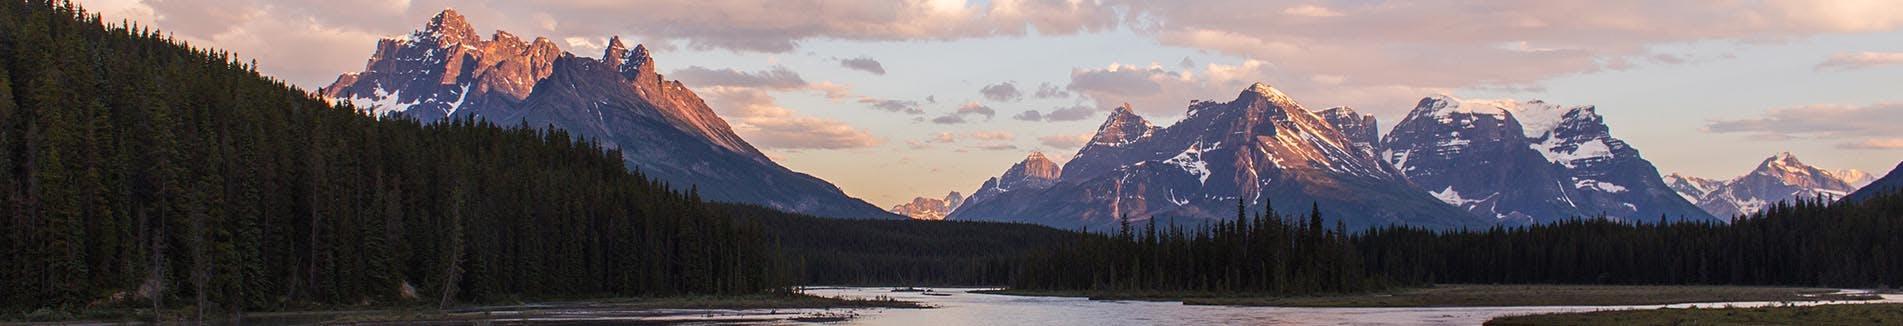 © Parks Canada / Lauren Beaton